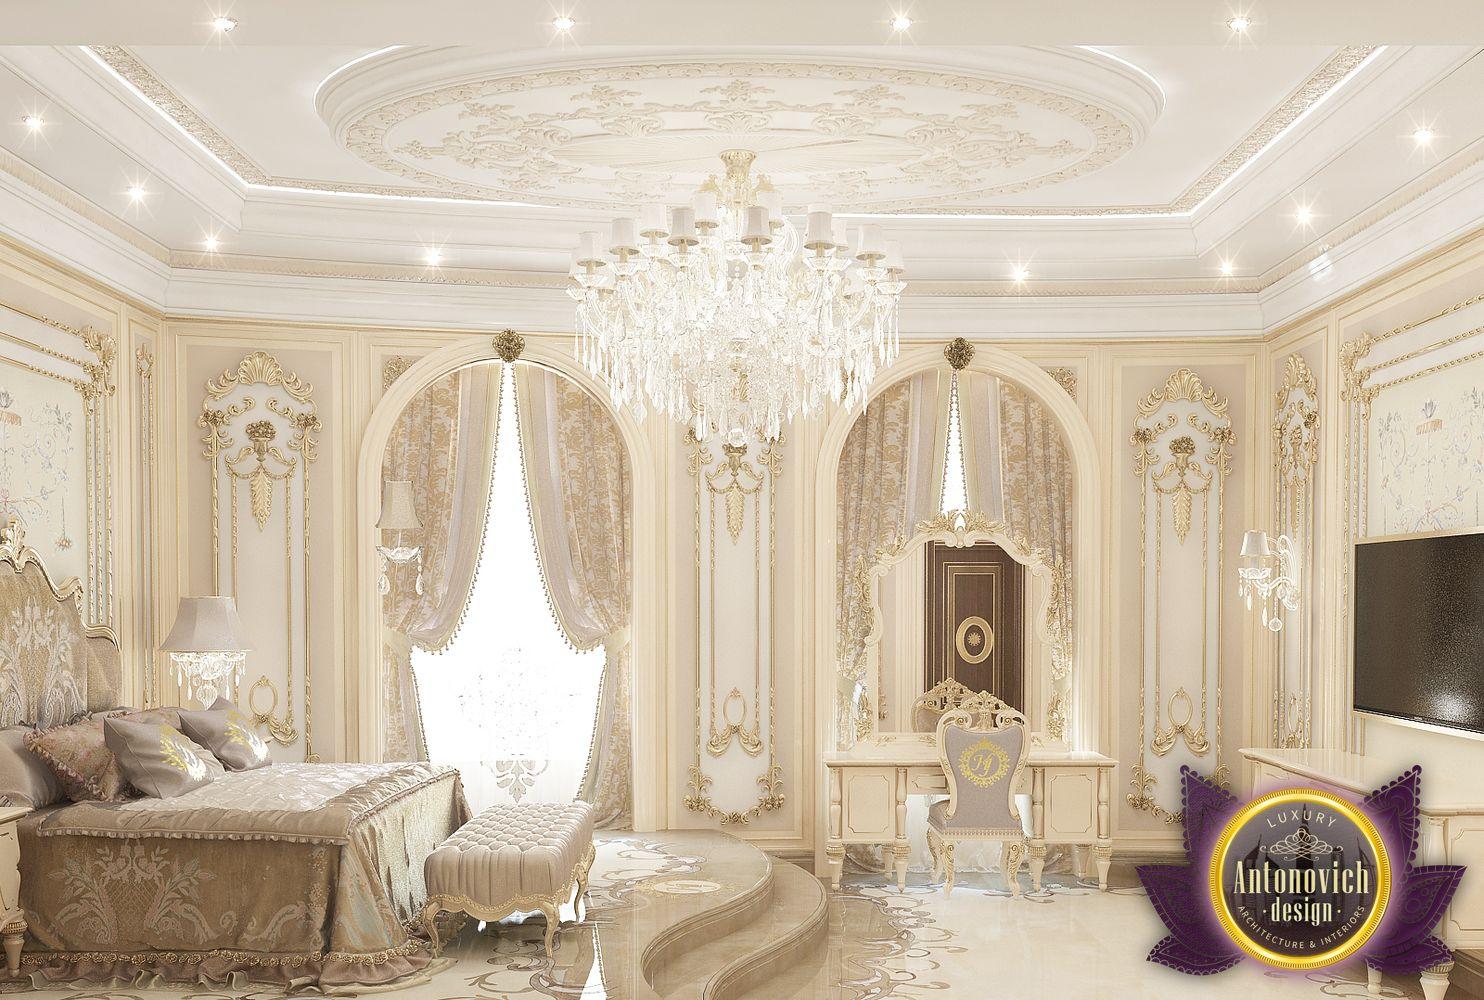 Bedroom Ideas: Nigeiradesign: Bedroom Design Ideas Of Katrina Antonovich